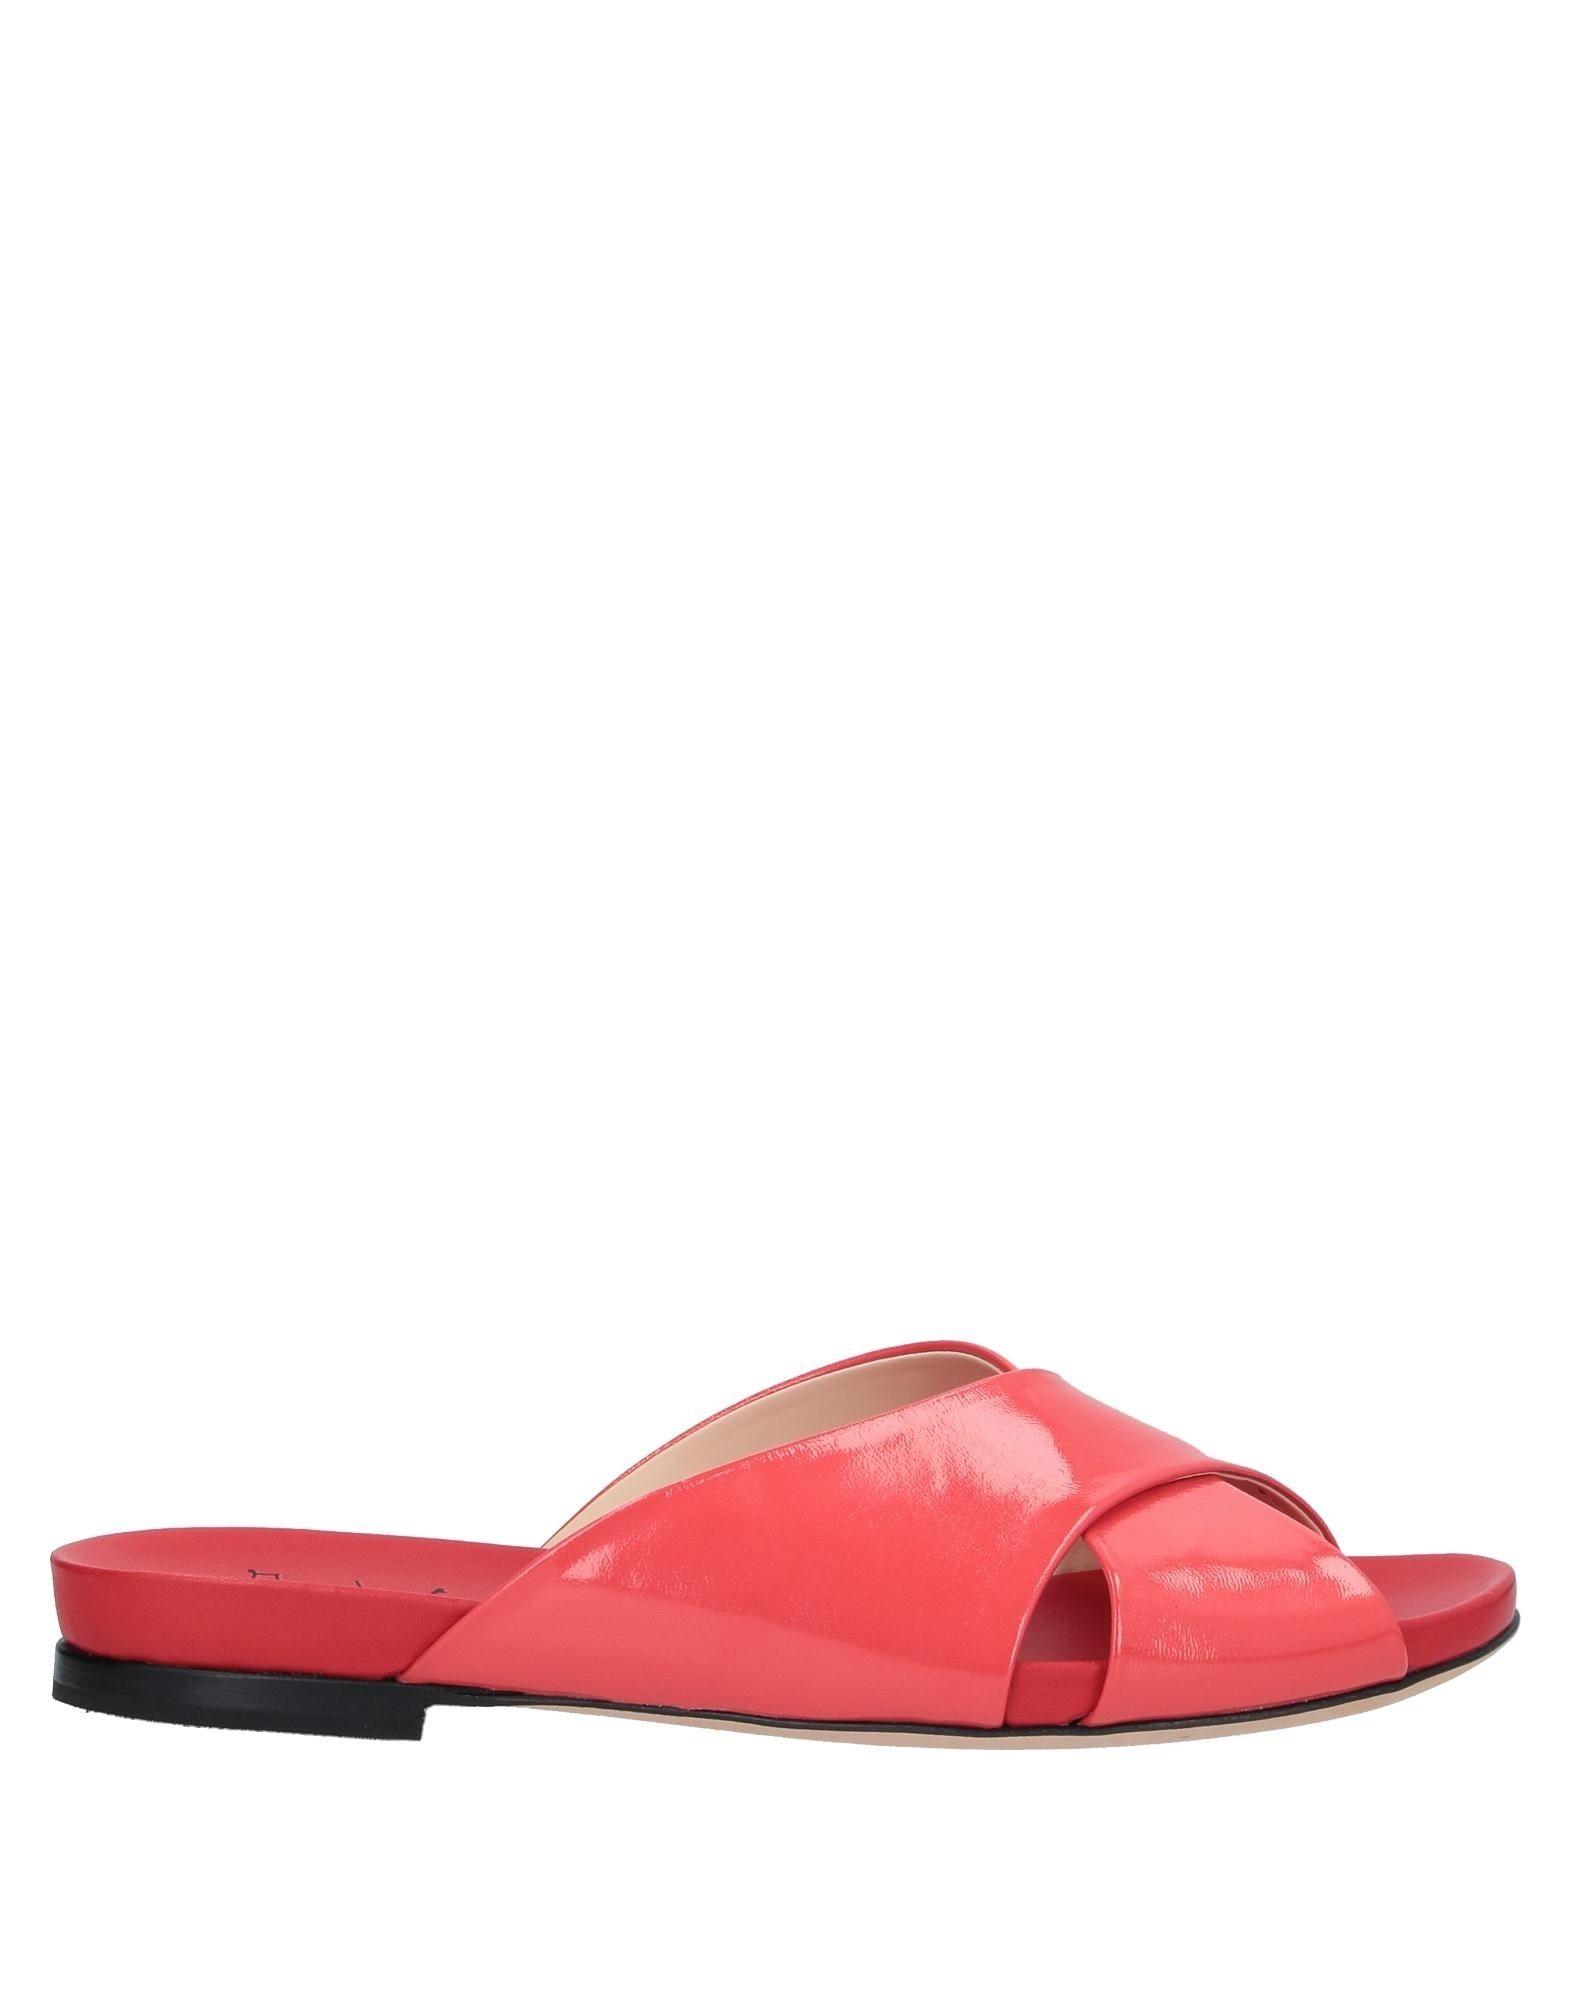 Sandales Fabi Femme - Sandales Fabi   - 11741153XX